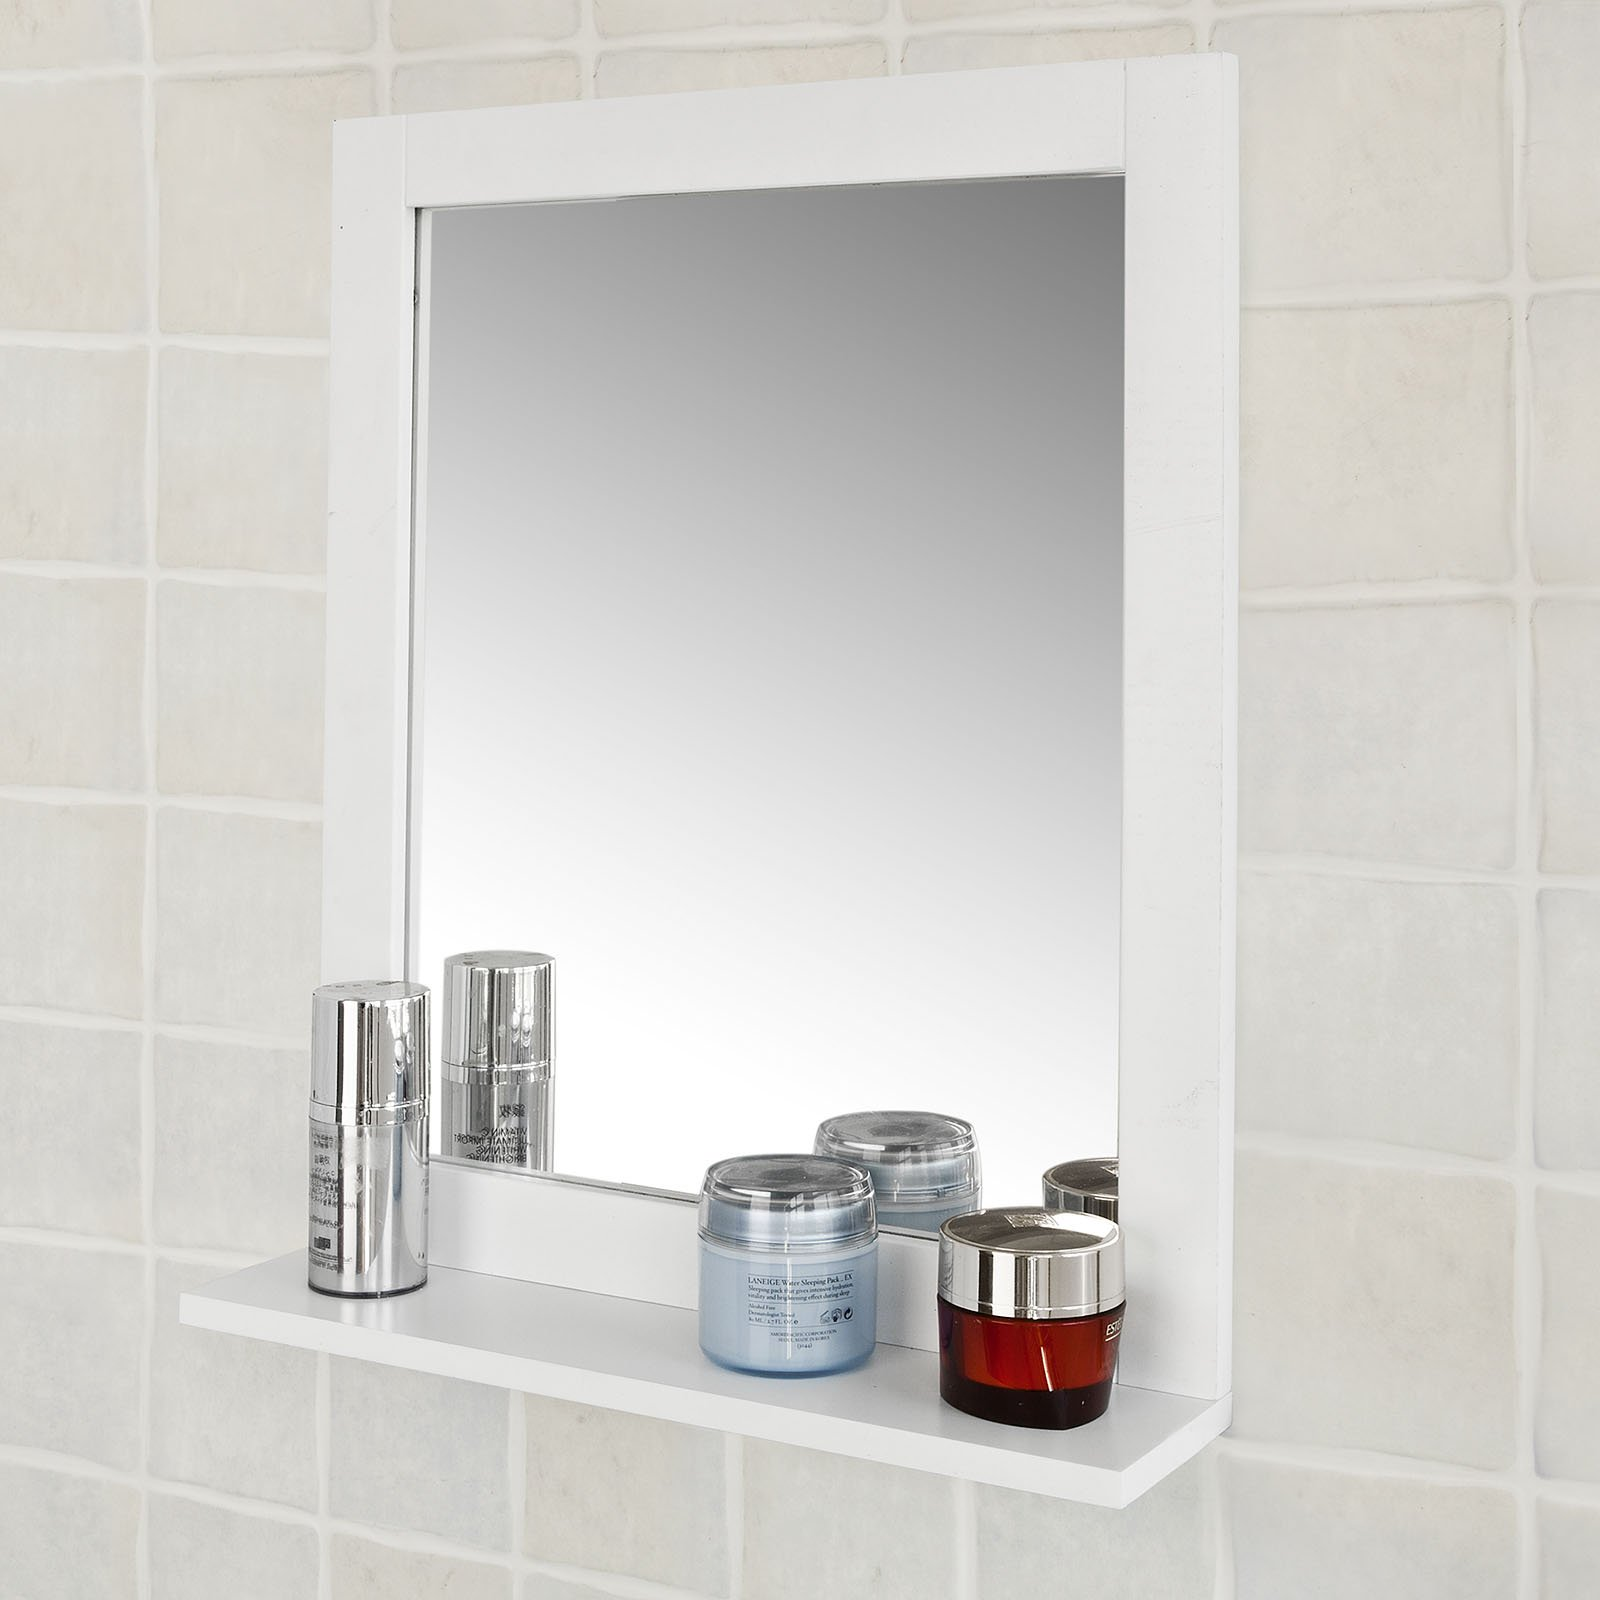 Bathroom mirror cabinet with shelf best mini electric screwdriver